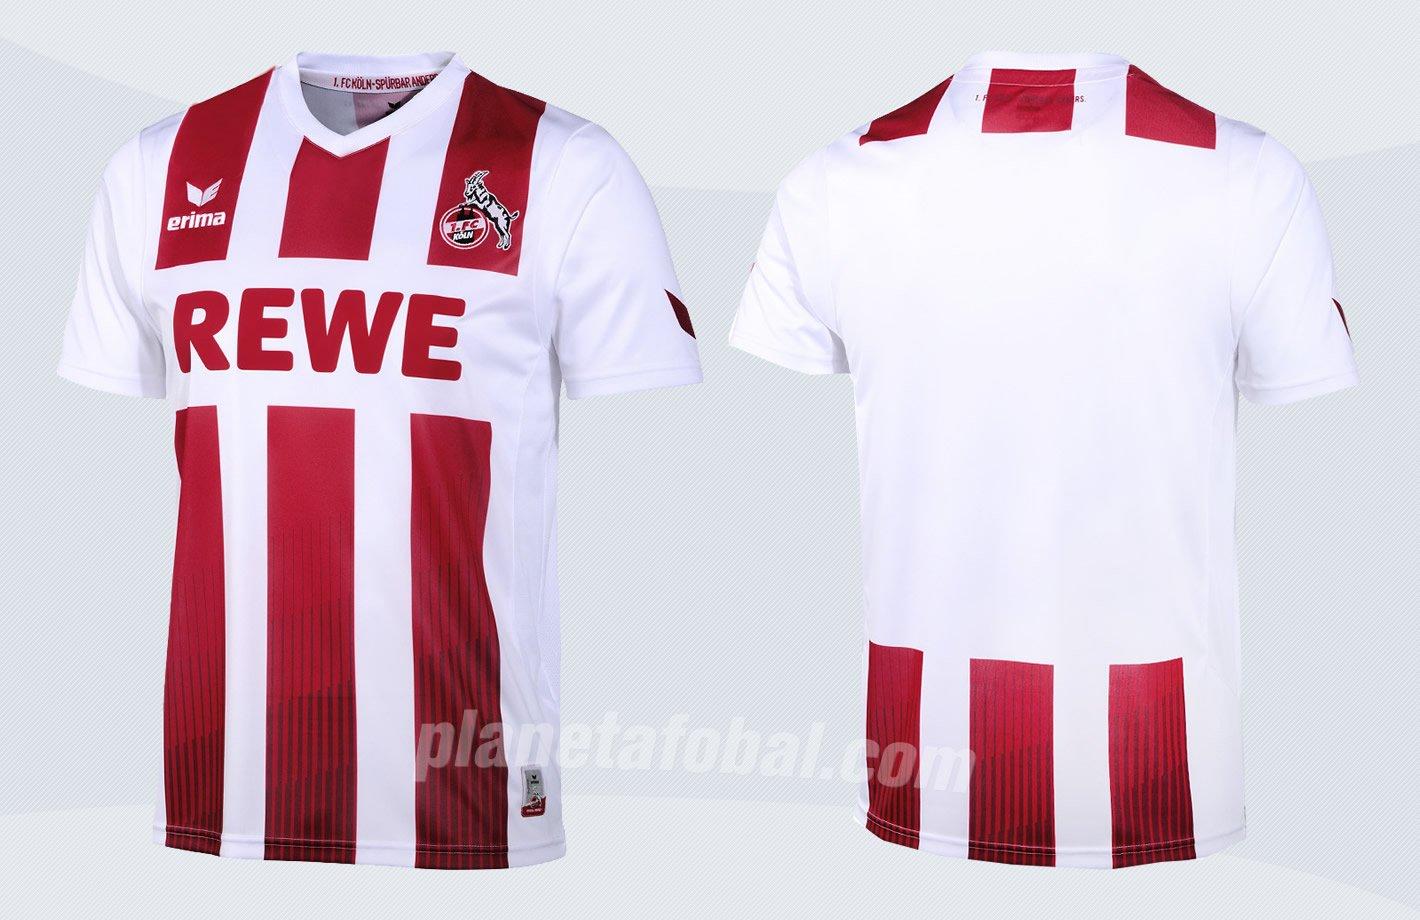 Camiseta titular Erima 2017-18 del FC Köln | Imágenes Web Oficial